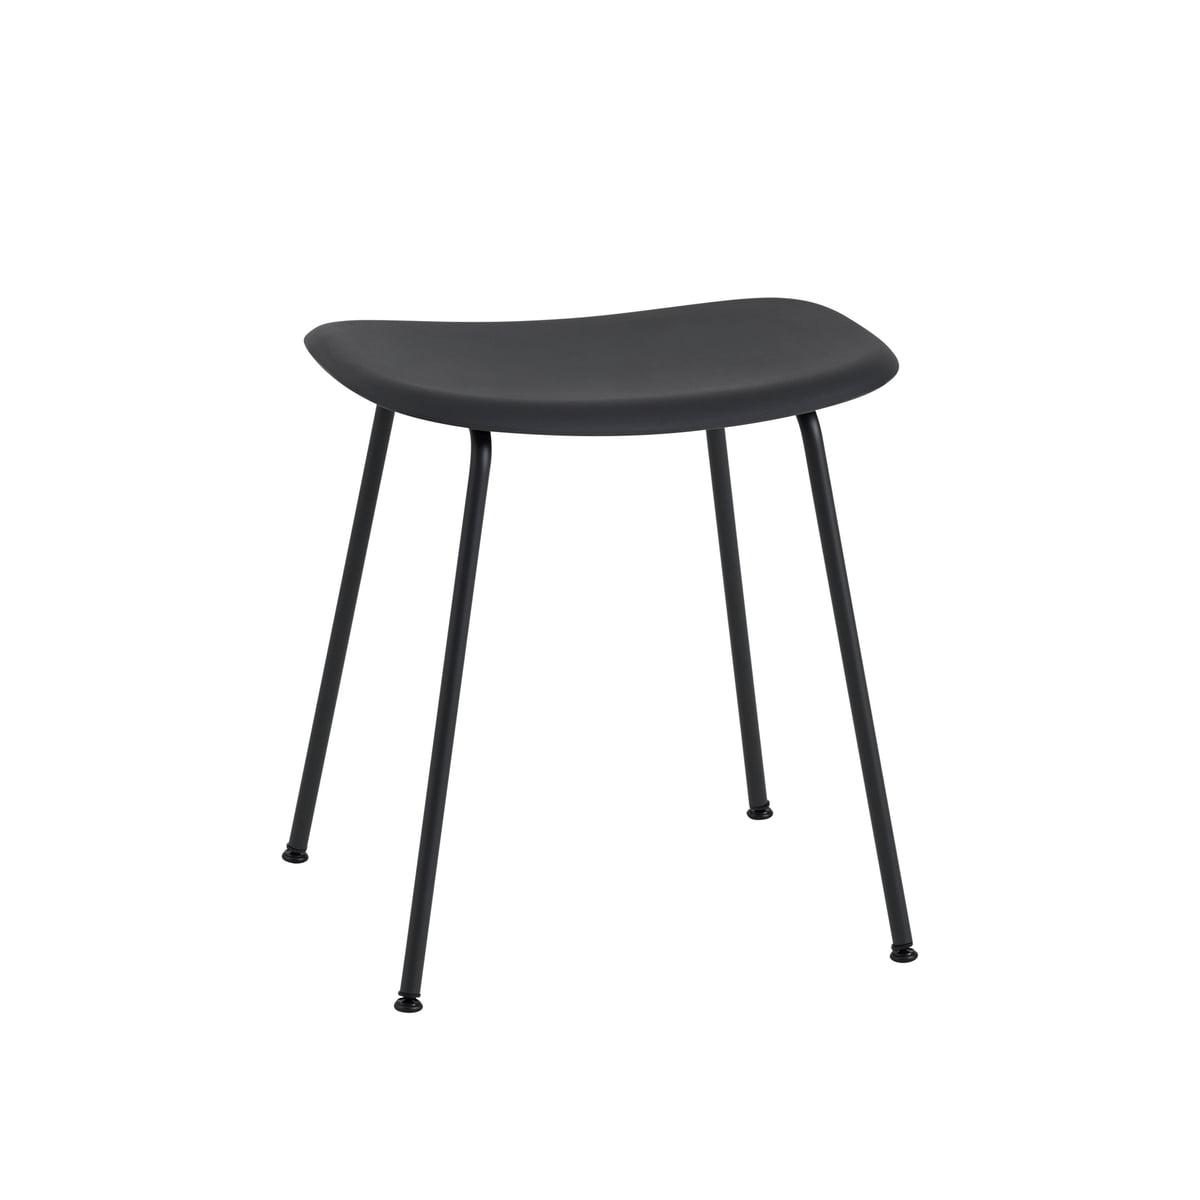 fiber stool metal base by muuto connox. Black Bedroom Furniture Sets. Home Design Ideas